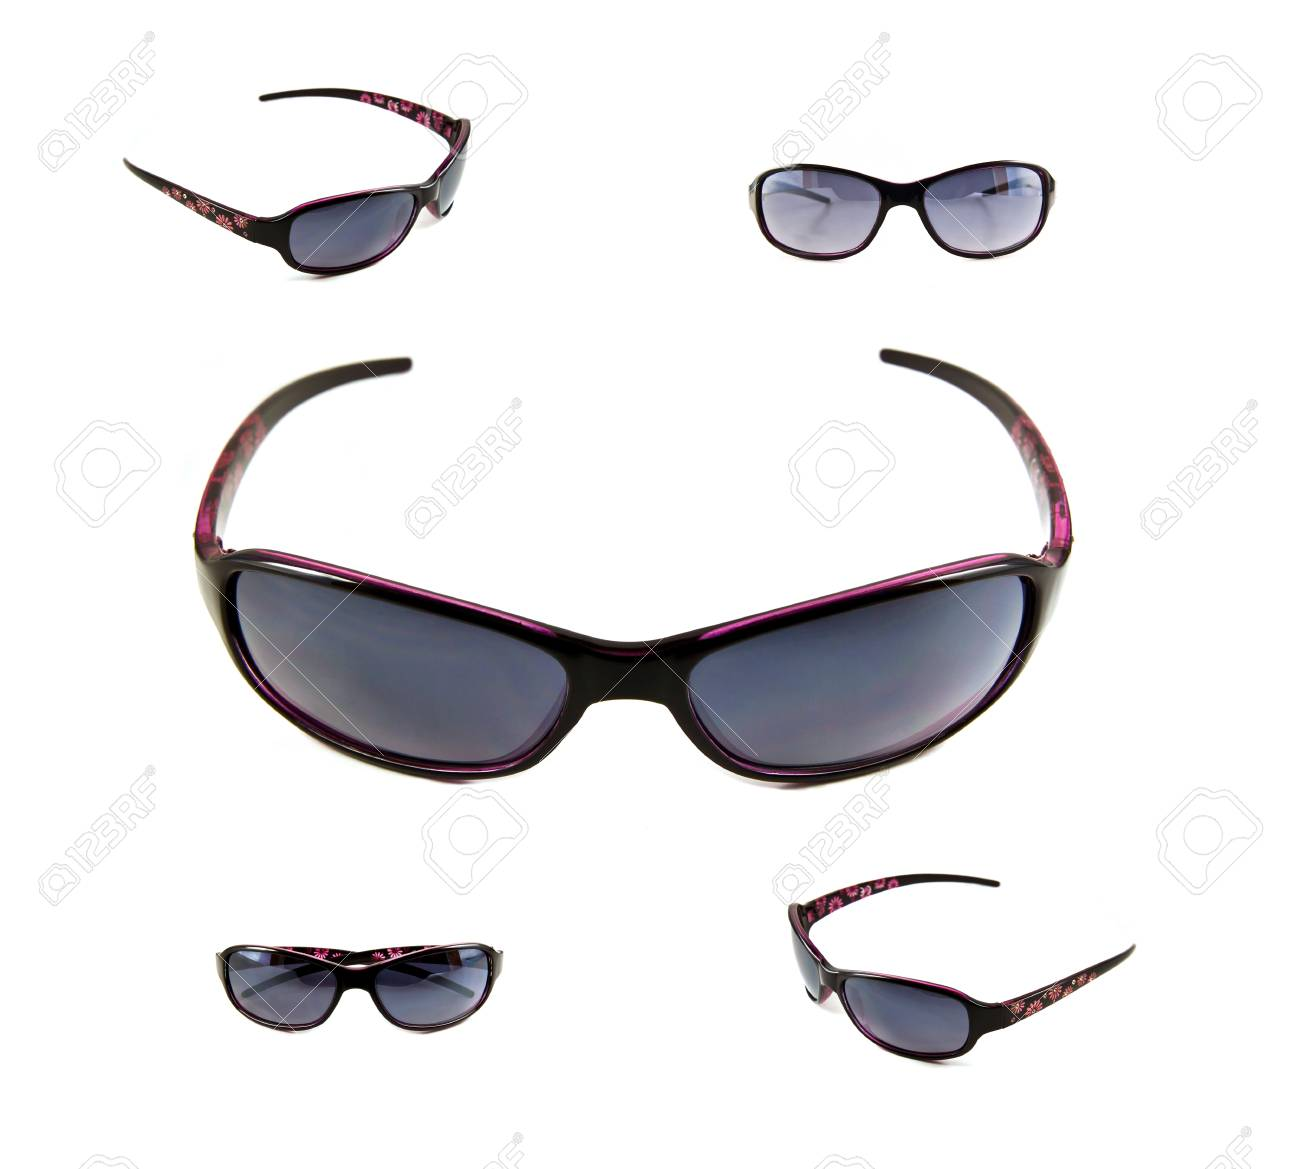 Set of black sunglasses isolated on the white background Stock Photo - 10057121